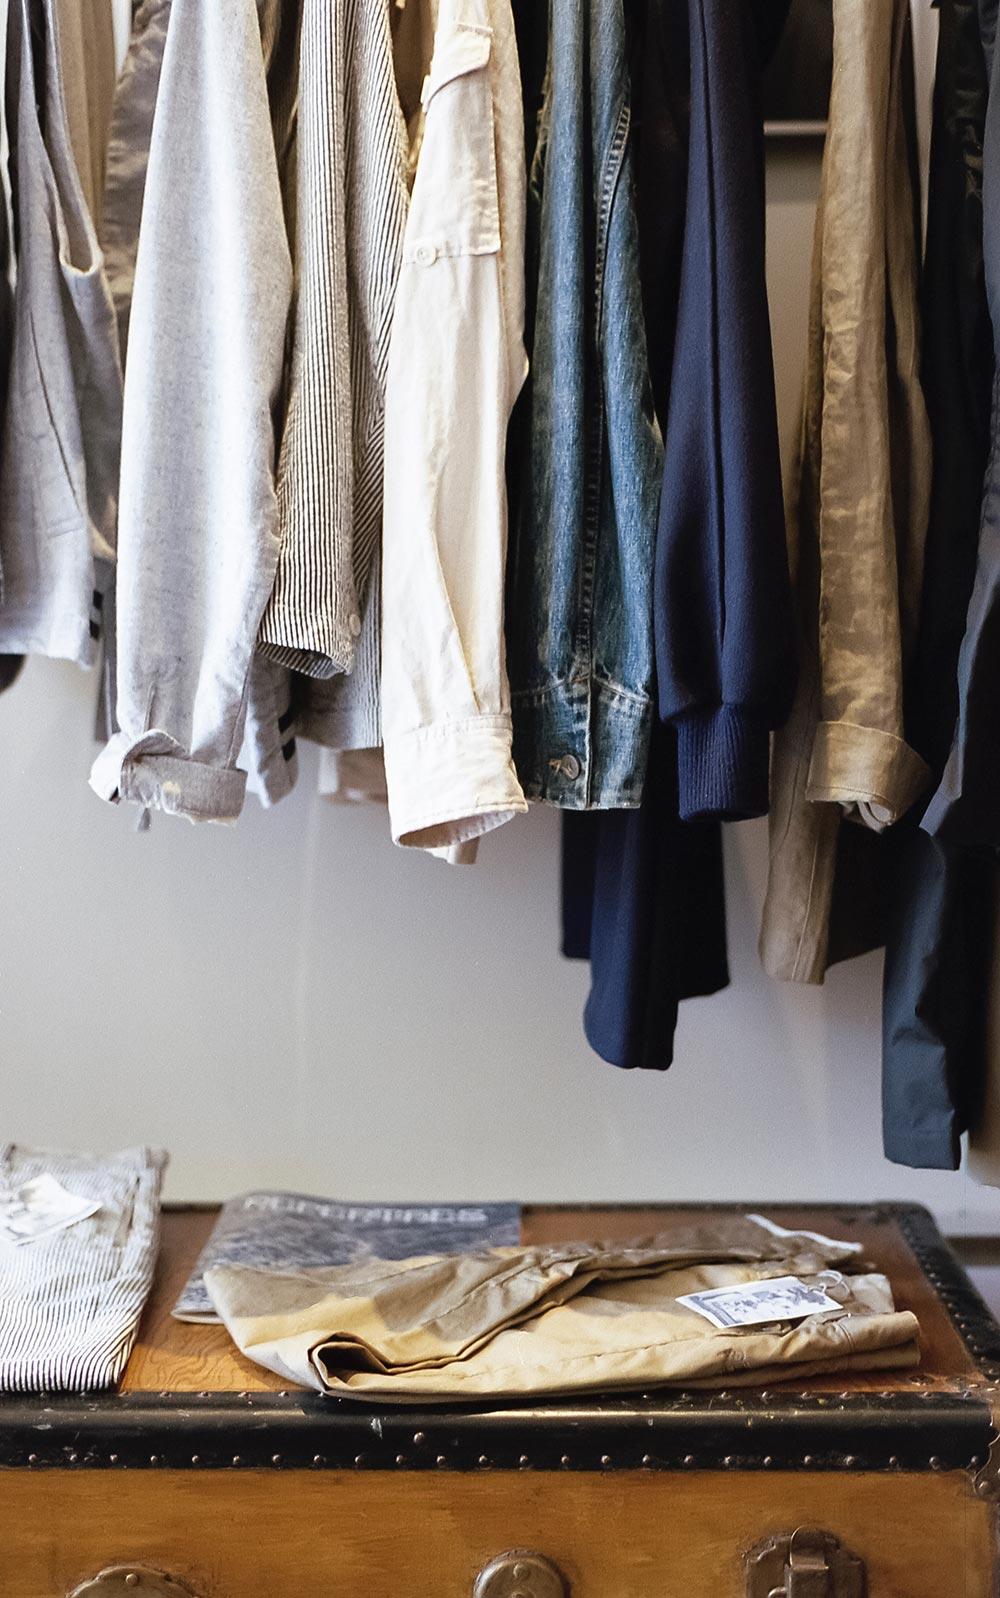 11 Vintage Shopping Tipps für Europa, Second Hand Designer Shopping, Vintage Shopping Guide, Modeblog, Style Blog, Fashion Blog, Reiseblog, www.whoismocca.com